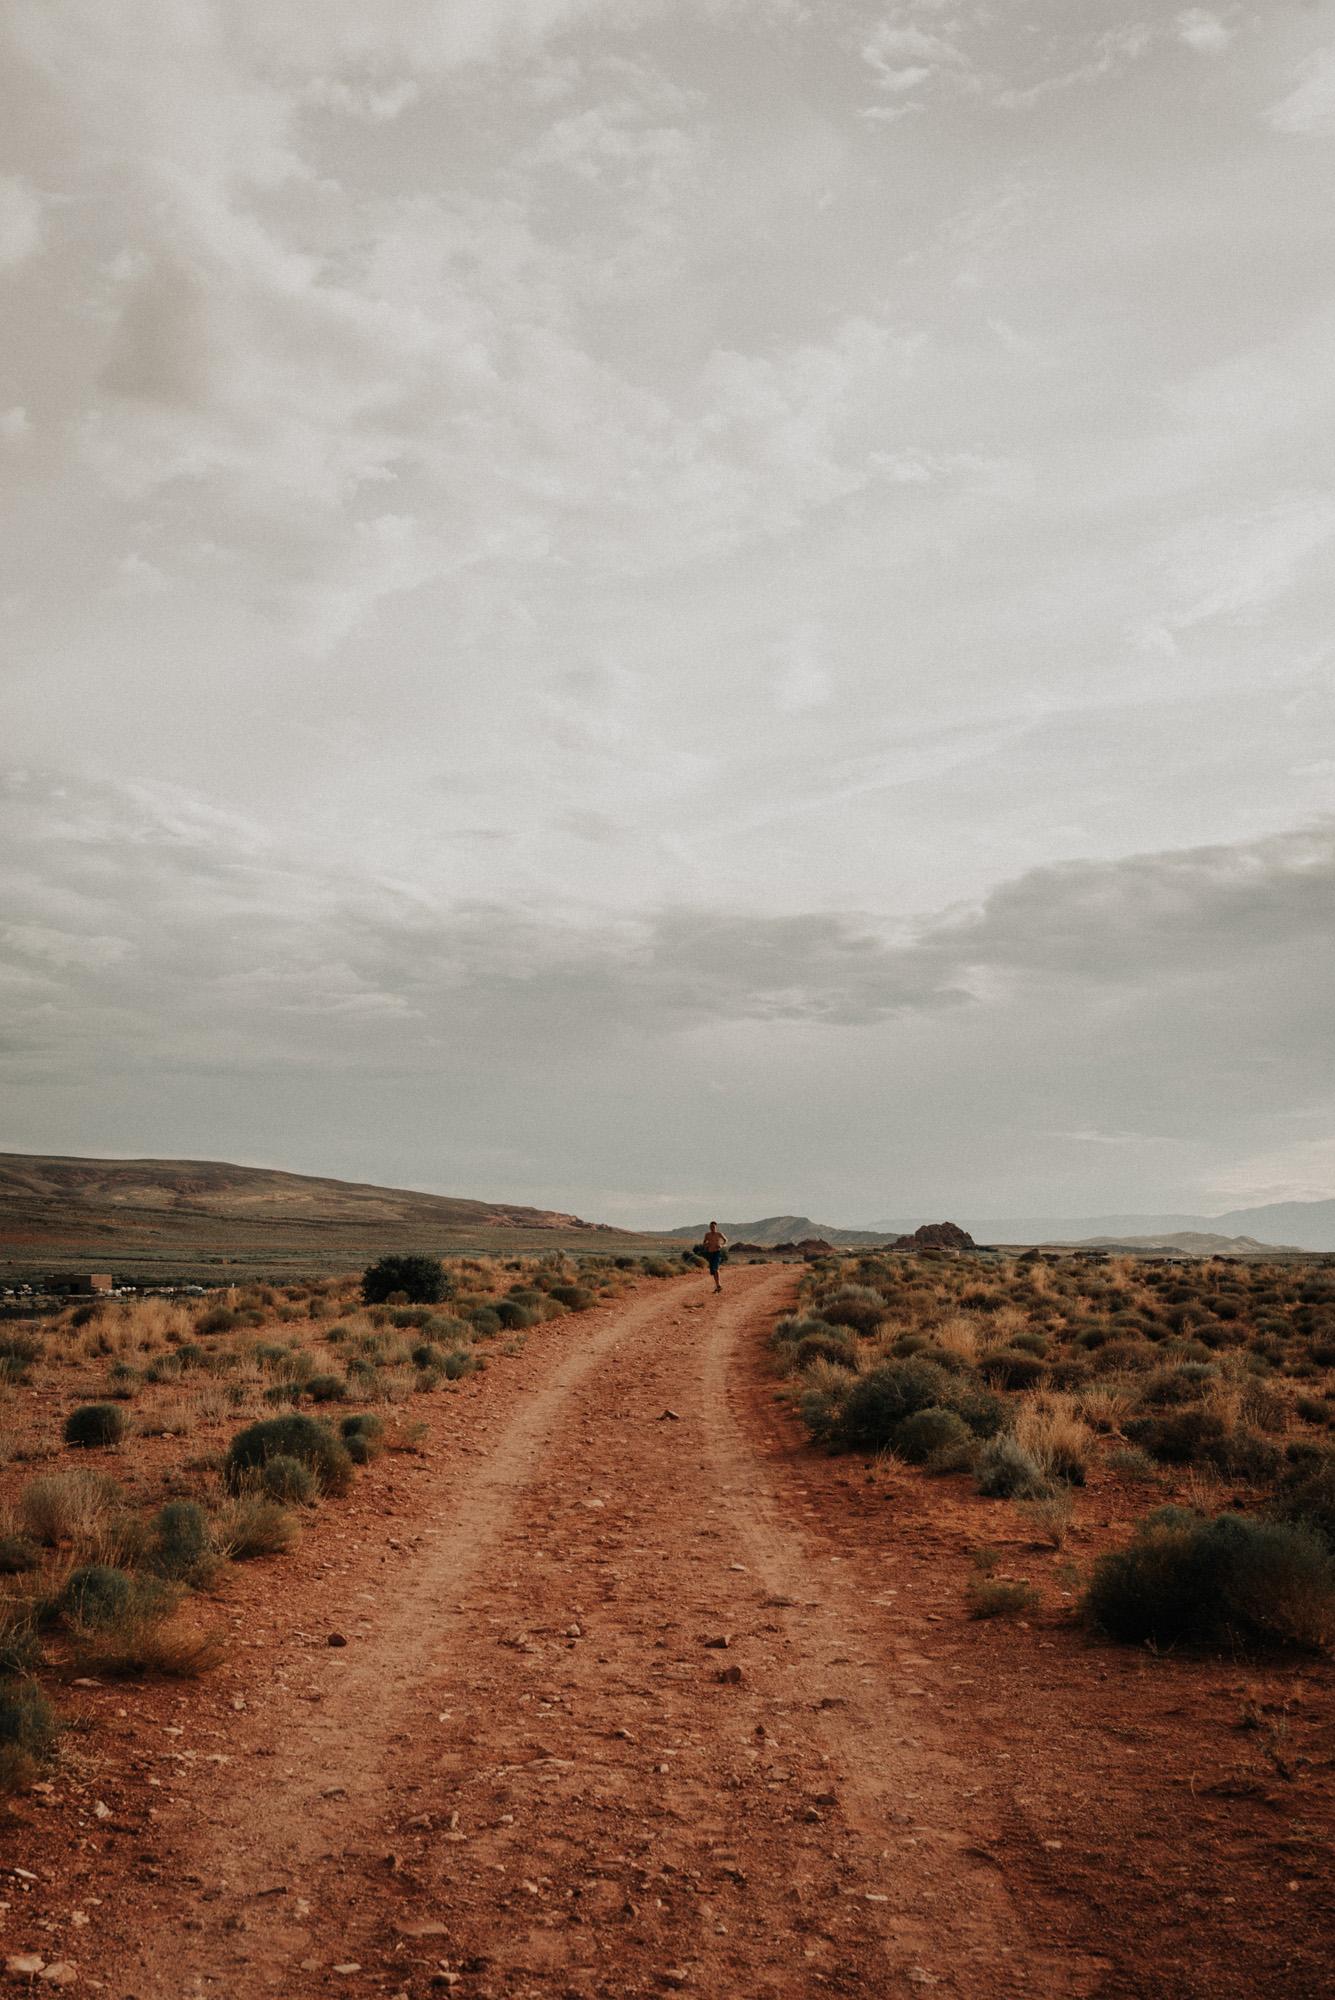 Sand hollow state park utah